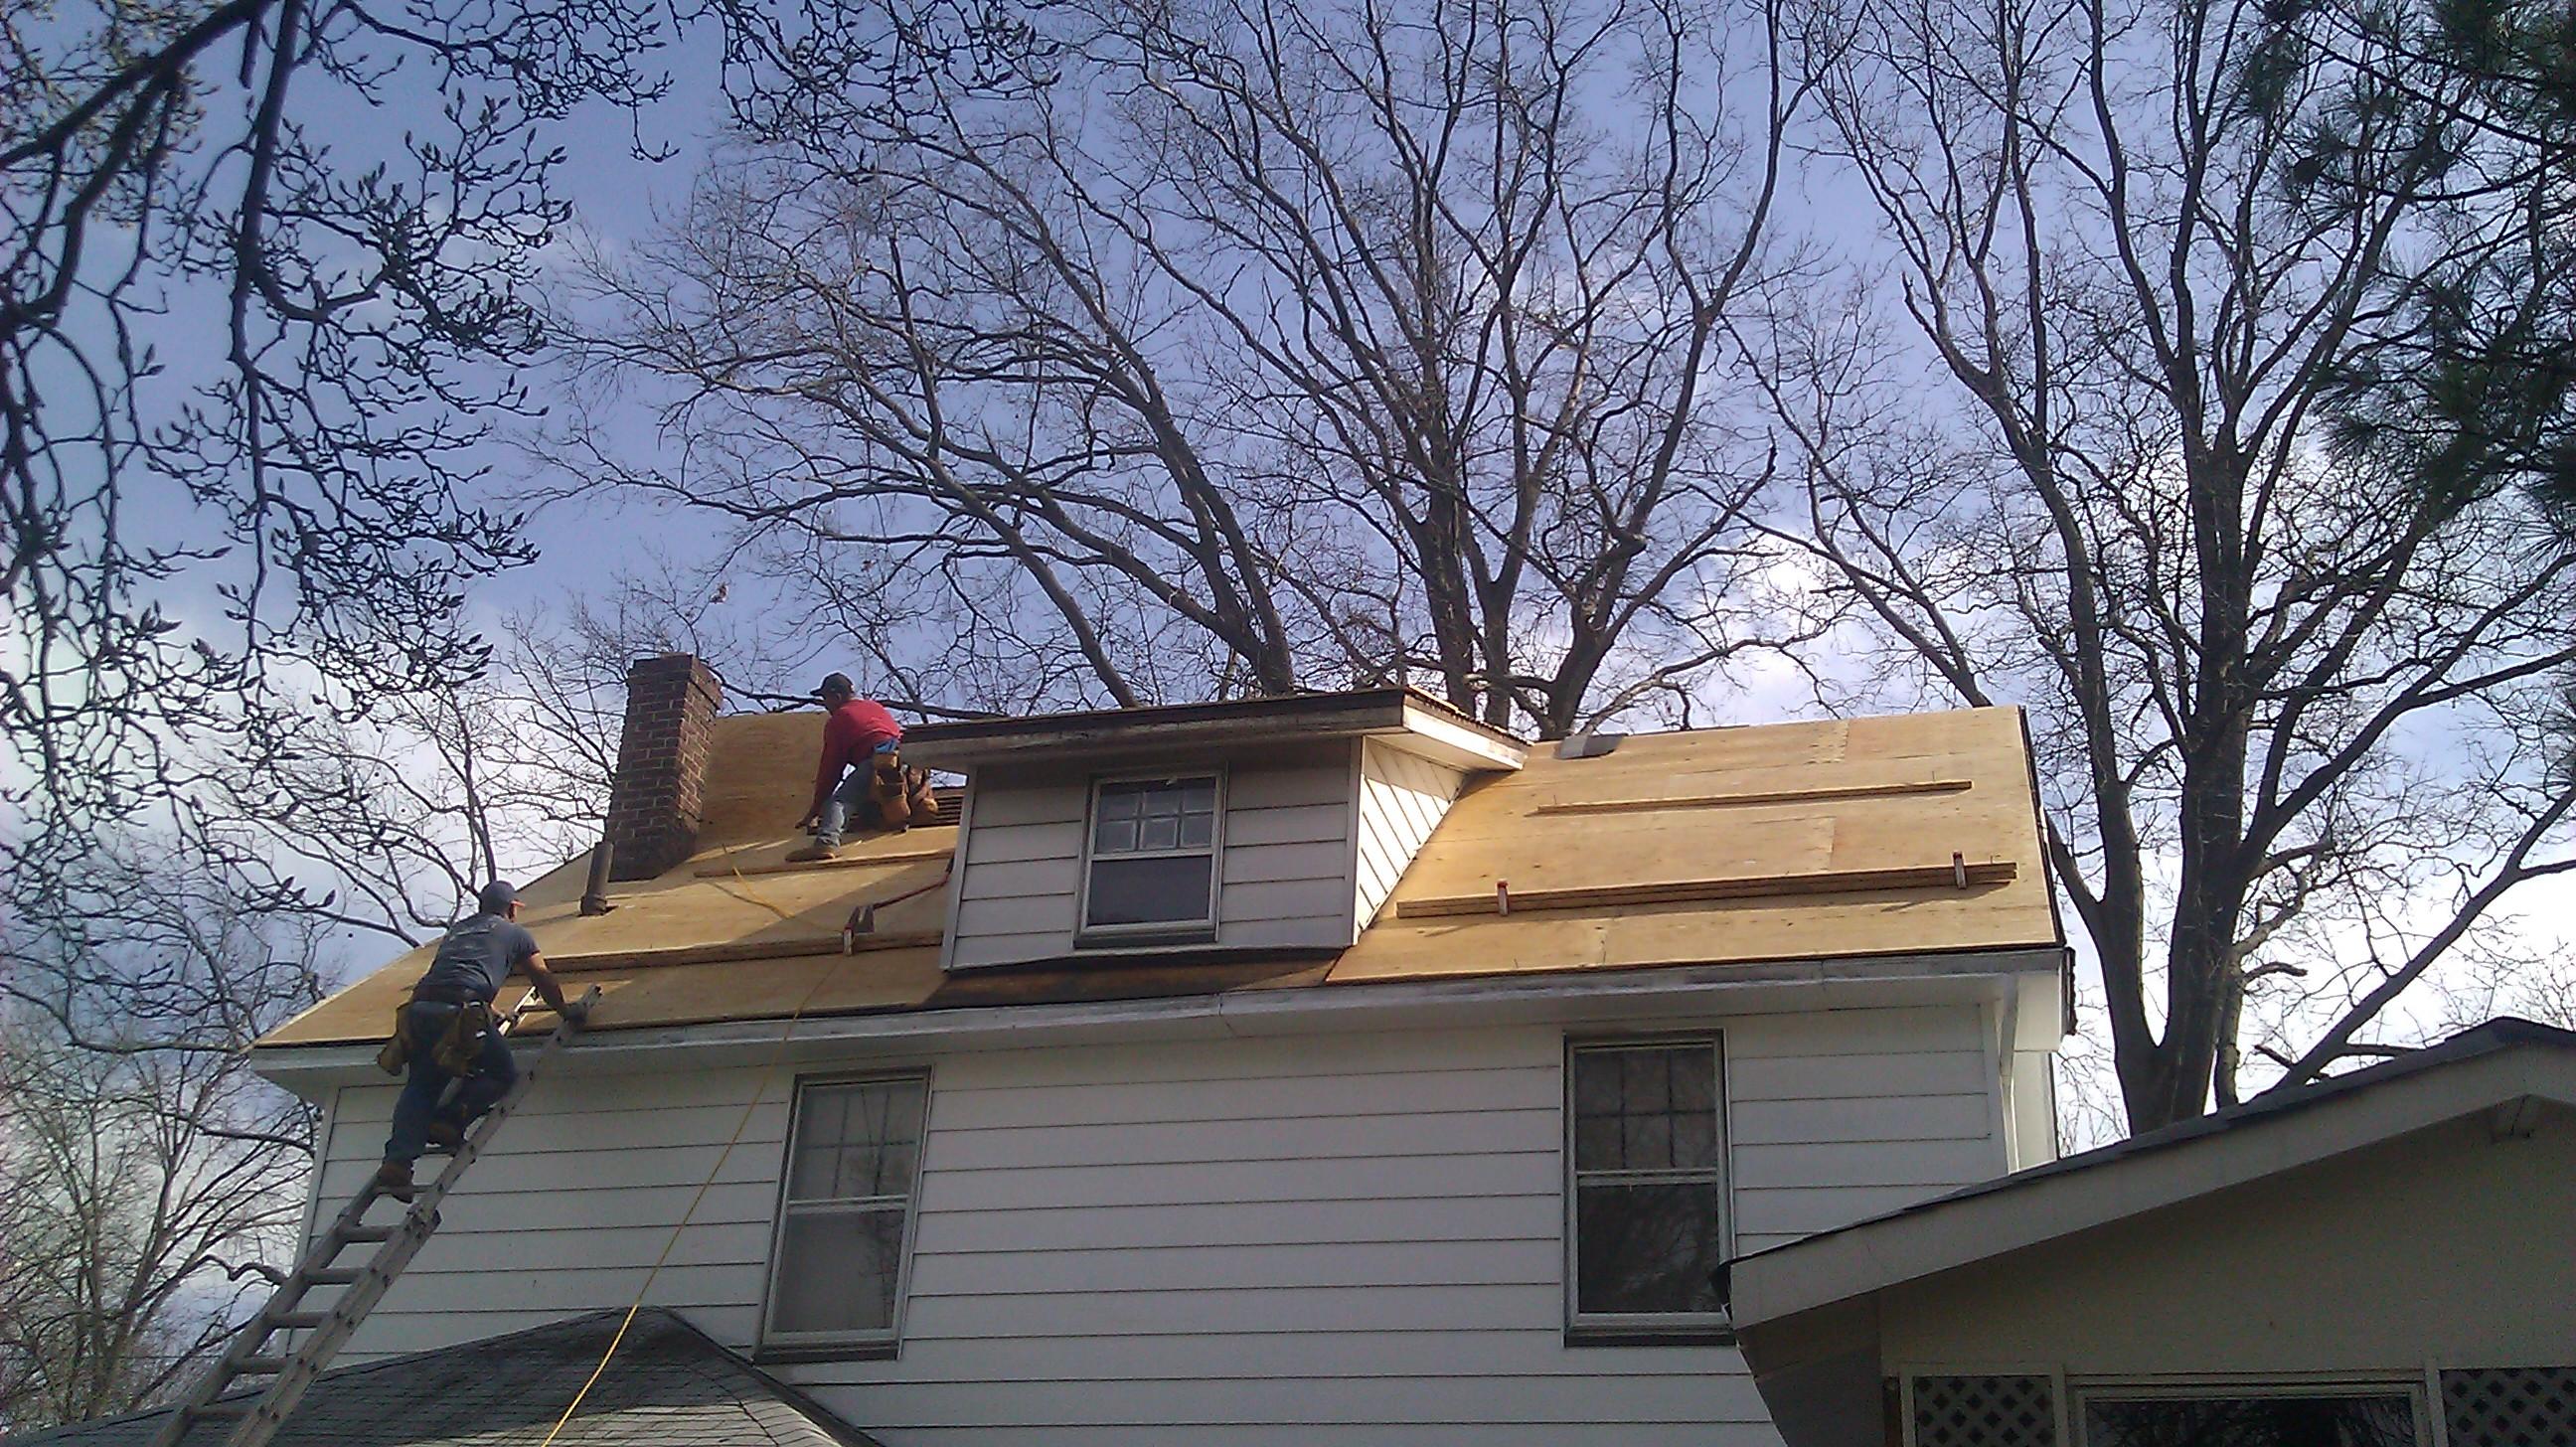 NJ Building Contractor LLC roofing job Image ProView